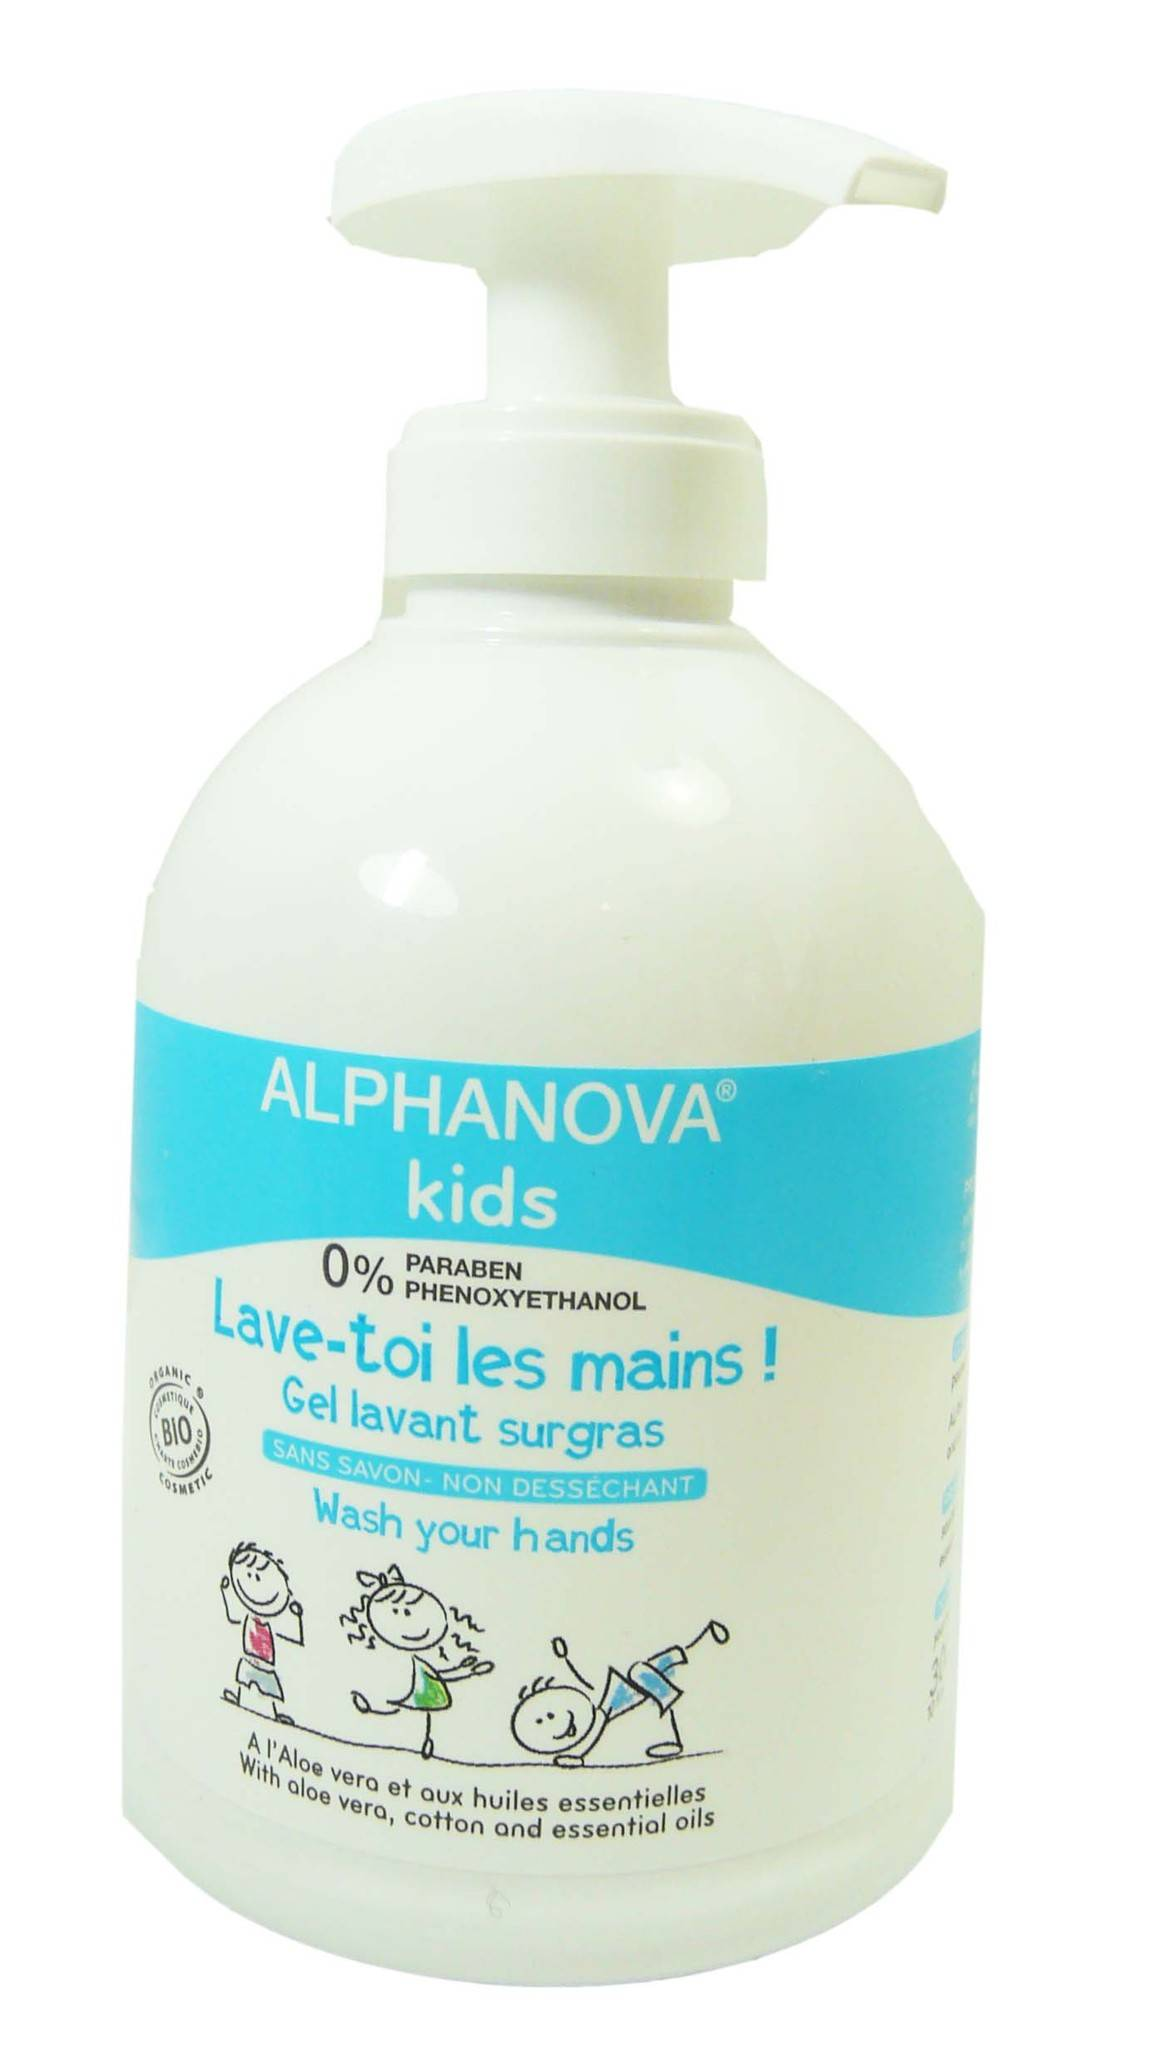 Alphanova kids 'lave toi les mains' 300ml